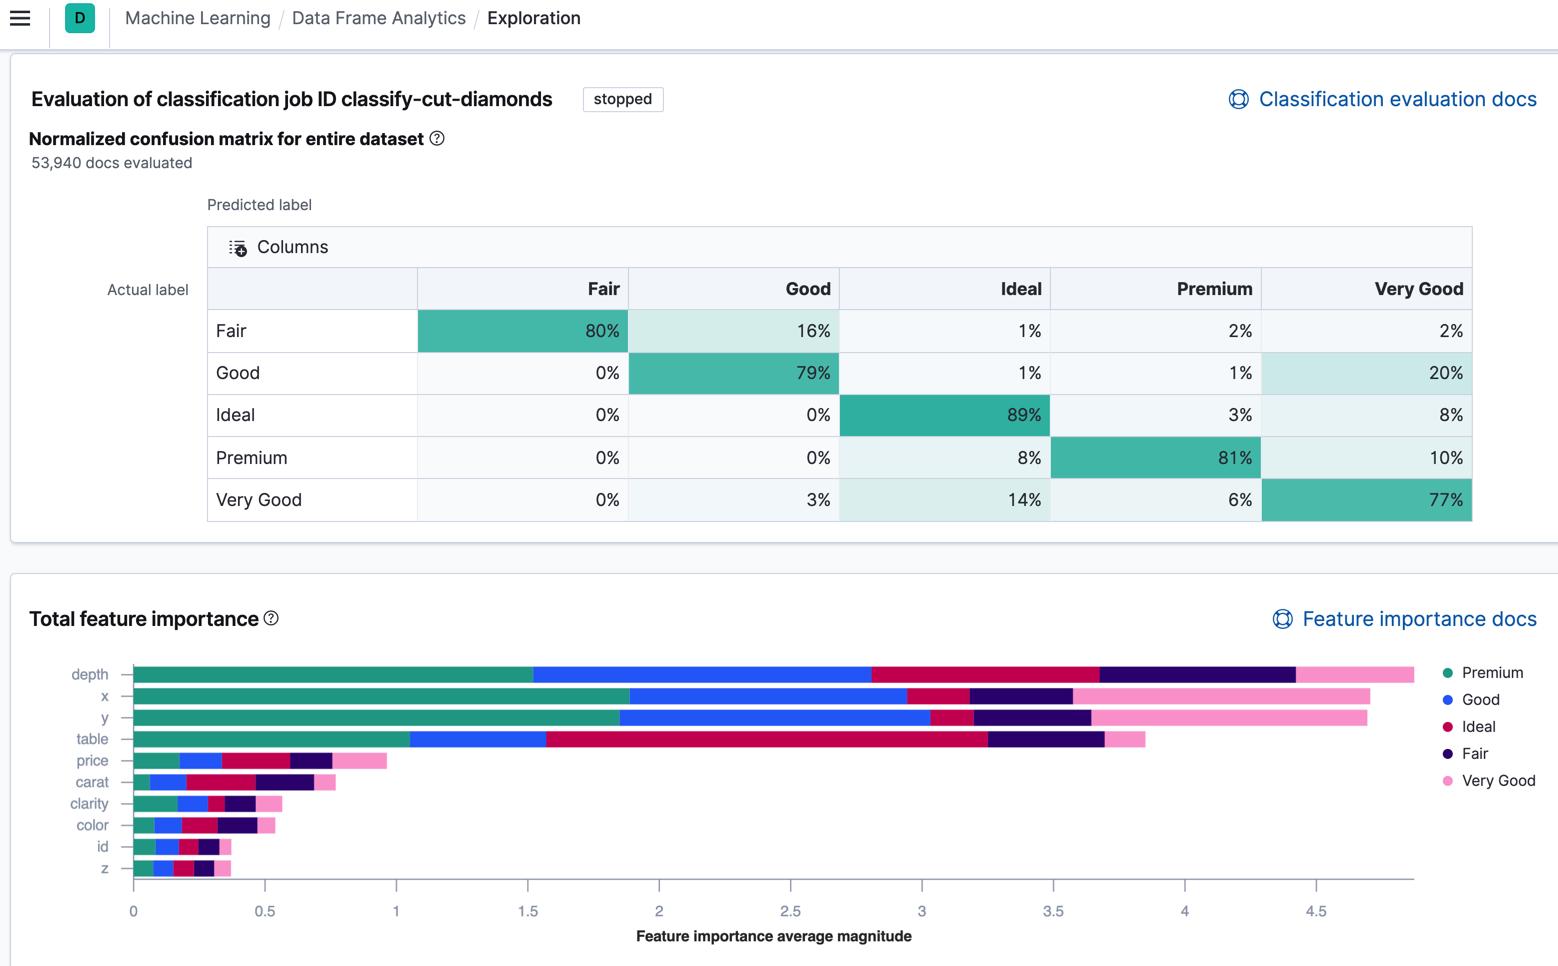 screenshot-machine-learning-visualizations-feature-importnace-710.png